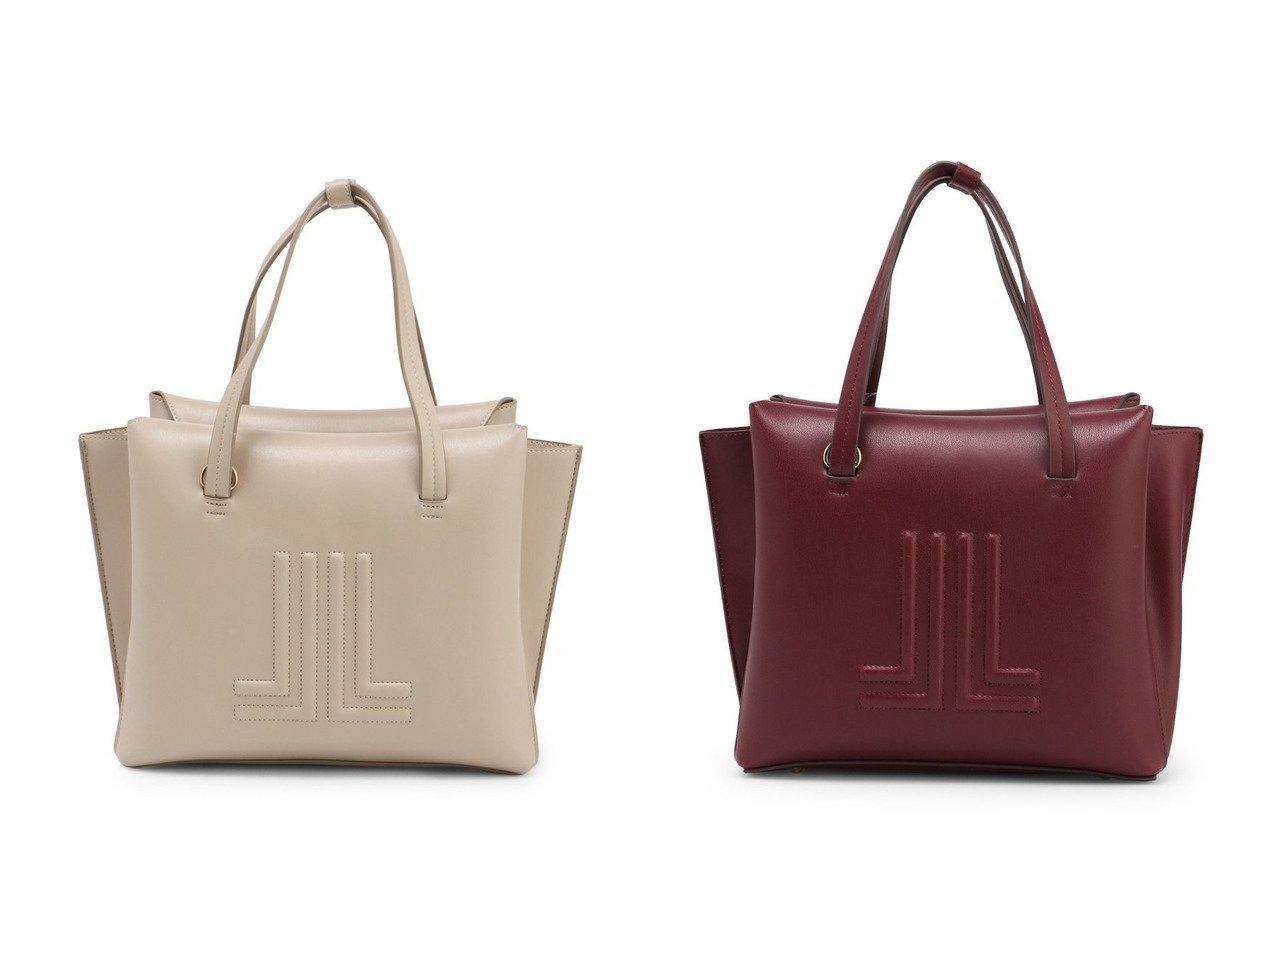 【LANVIN en Bleu/ランバン オン ブルー】のJL型押しトートバッグ 【バッグ・鞄】おすすめ!人気、トレンド・レディースファッションの通販  おすすめで人気の流行・トレンド、ファッションの通販商品 メンズファッション・キッズファッション・インテリア・家具・レディースファッション・服の通販 founy(ファニー) https://founy.com/ ファッション Fashion レディースファッション WOMEN バッグ Bag フォルム |ID:crp329100000027387